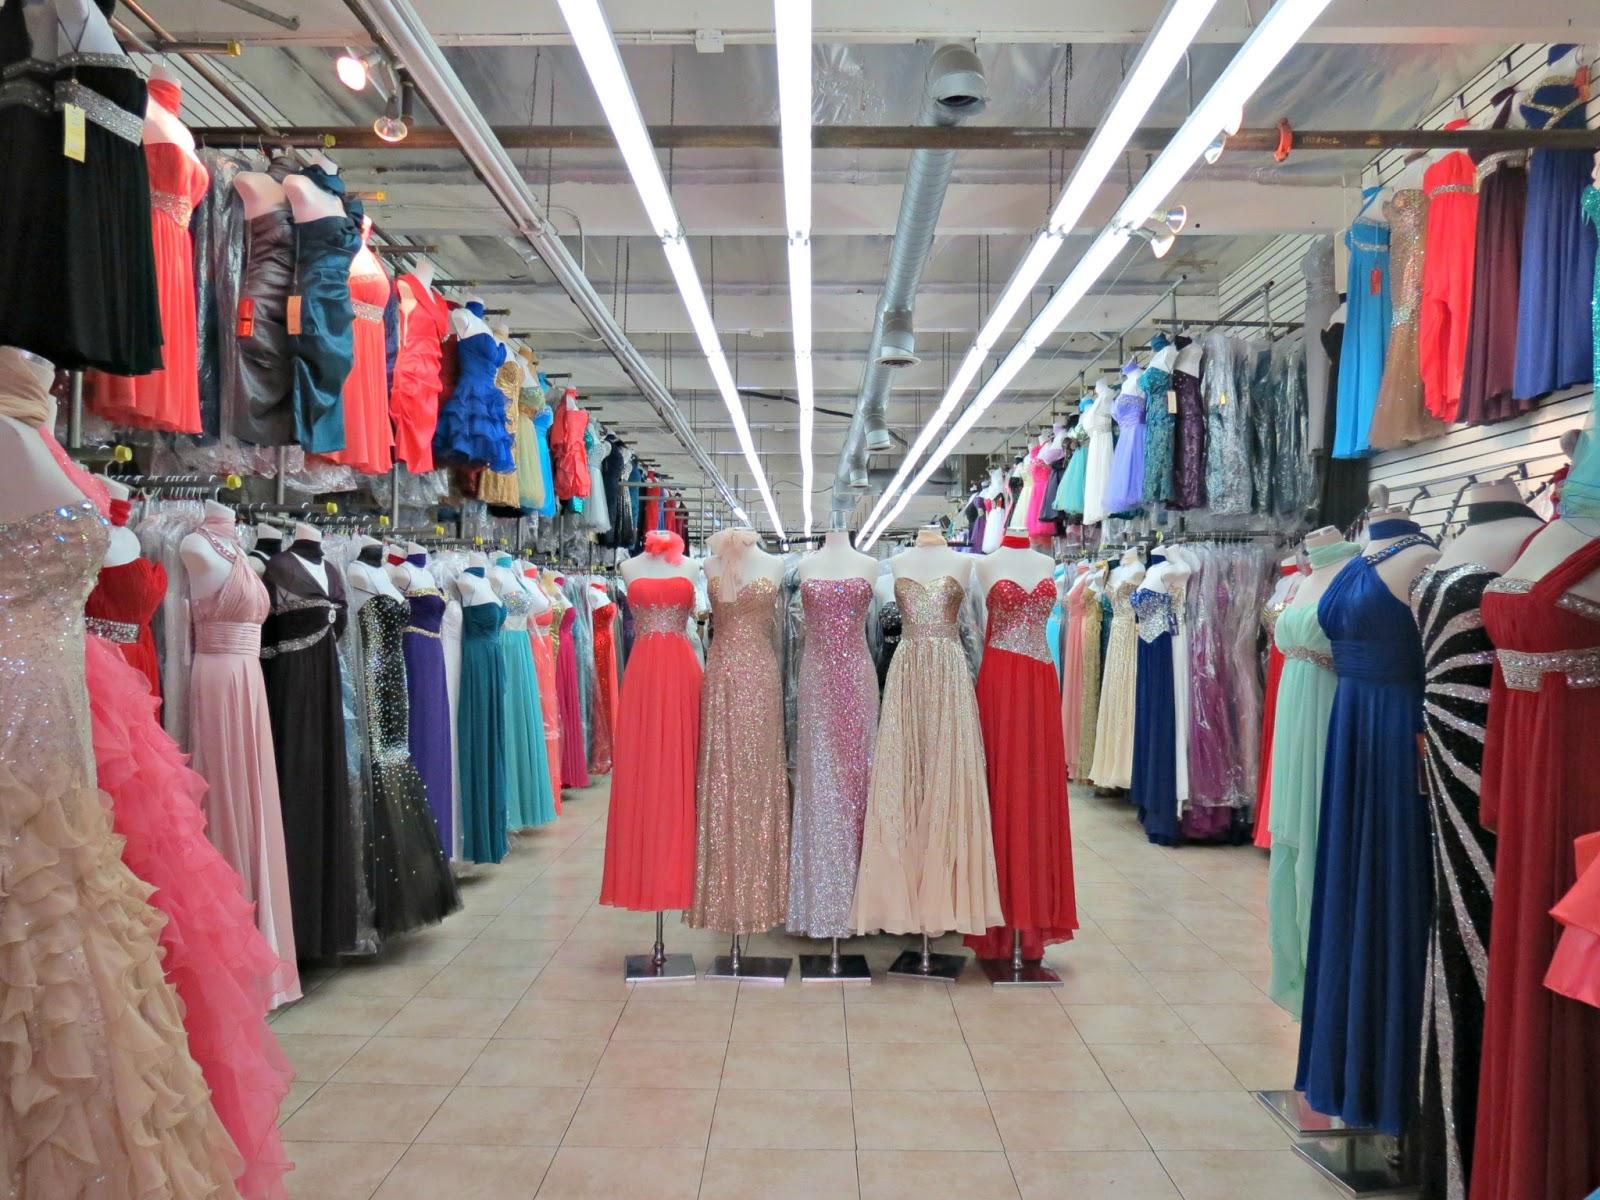 Slauson super mall for Jewelry slauson swap meet